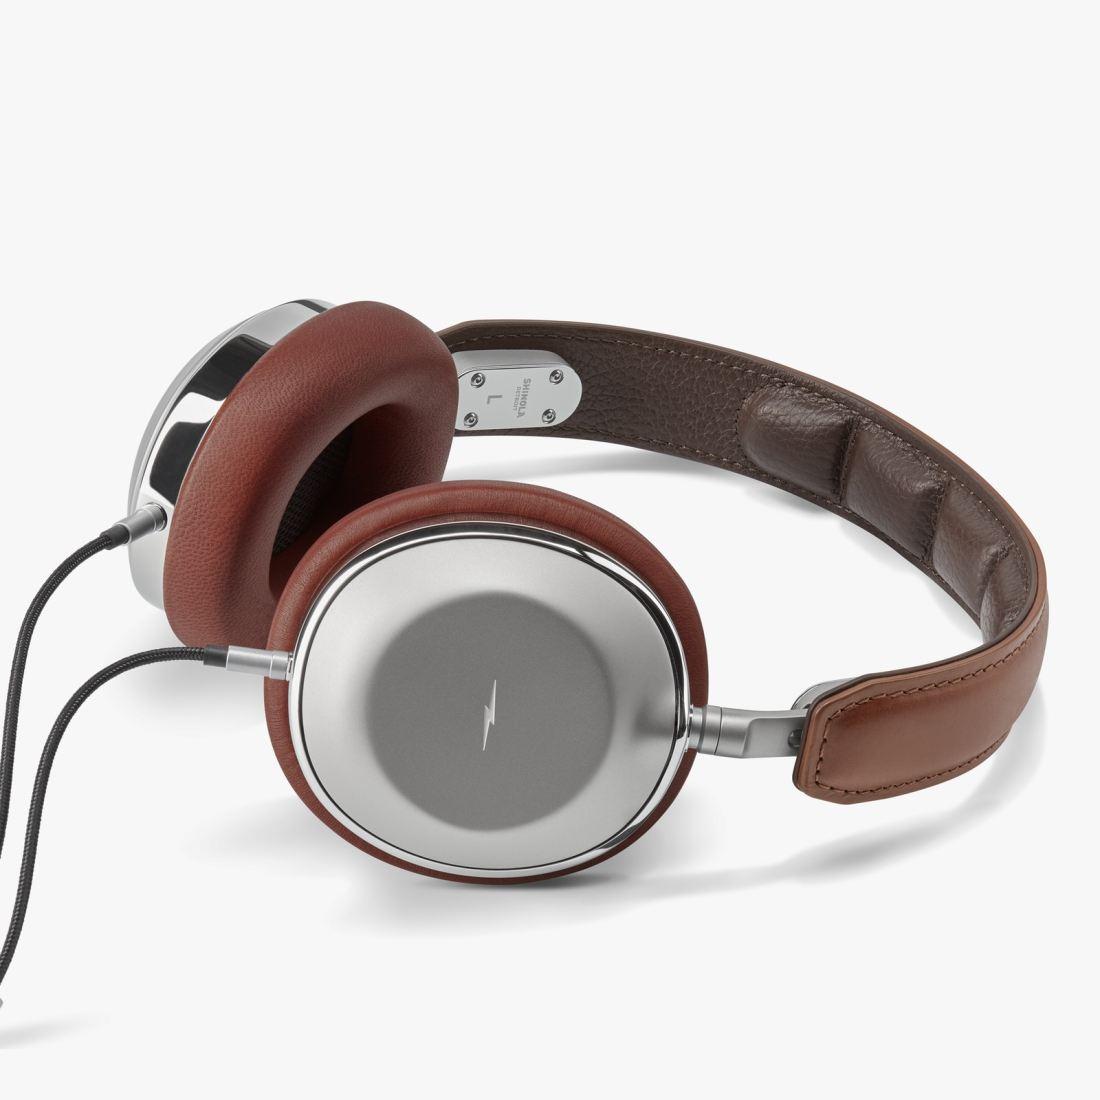 [Review] Shinola Canfield Headphones